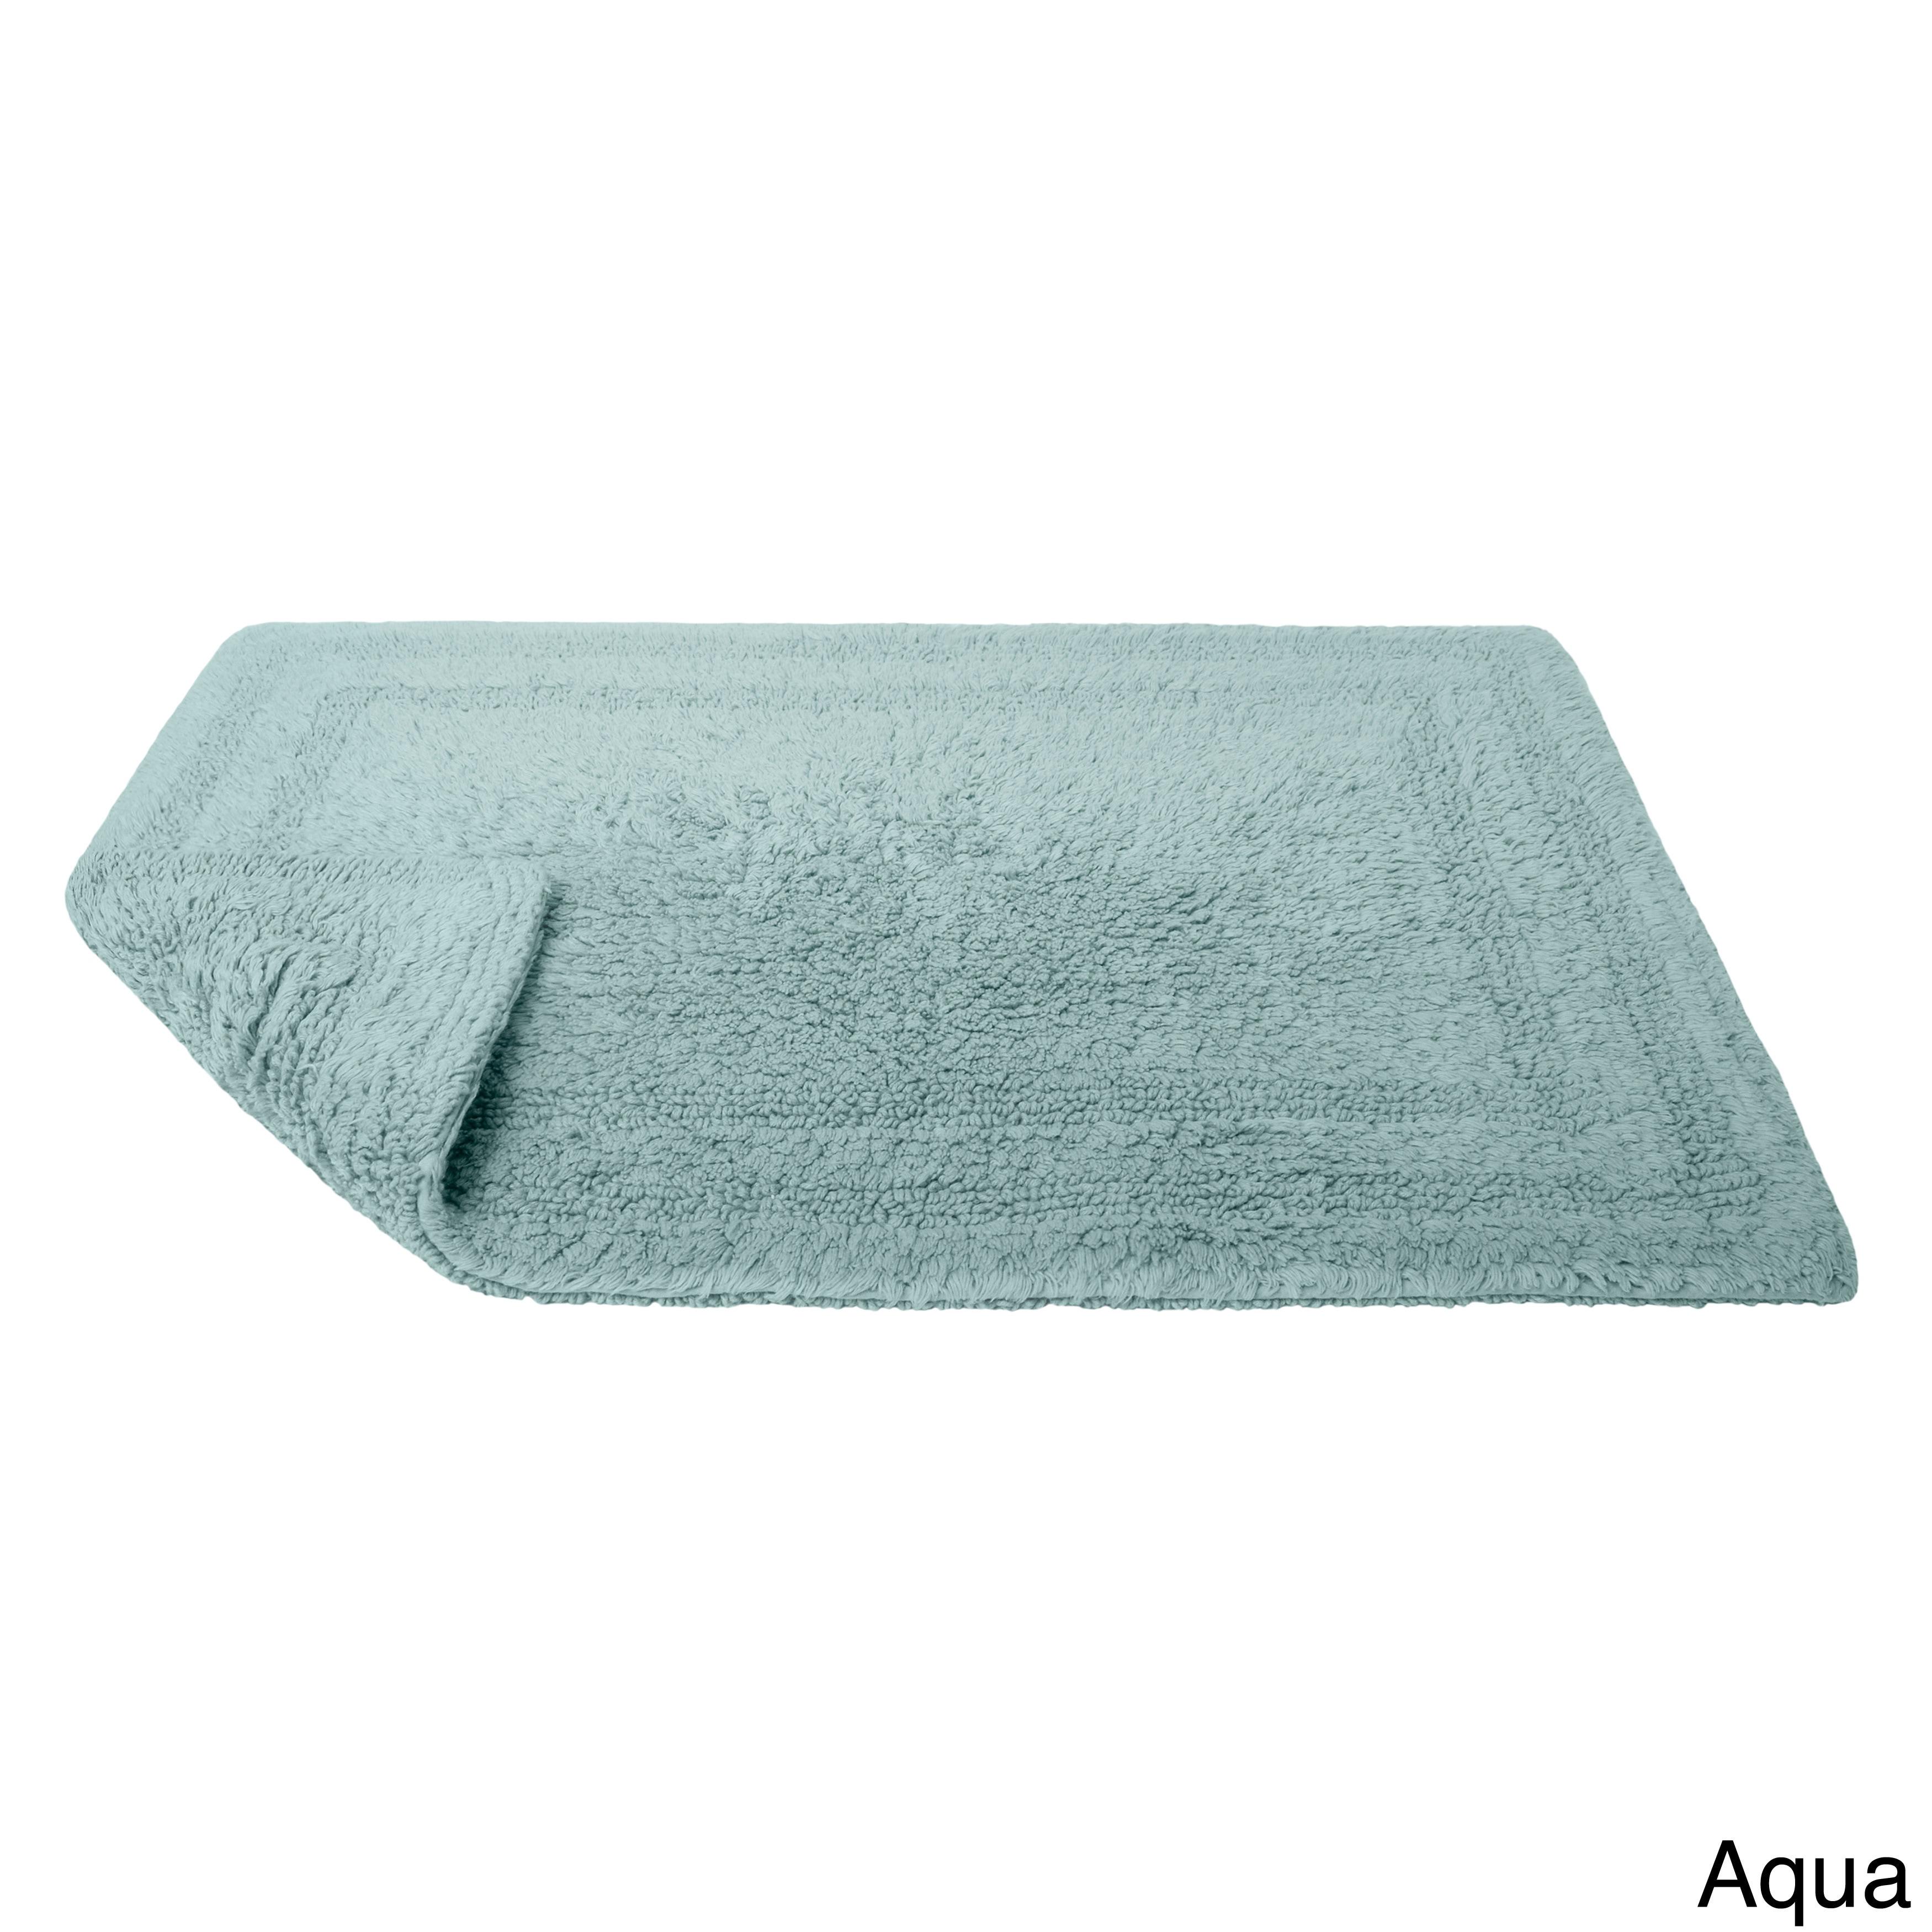 Cotton Reversible Bath Rug 24 X 34